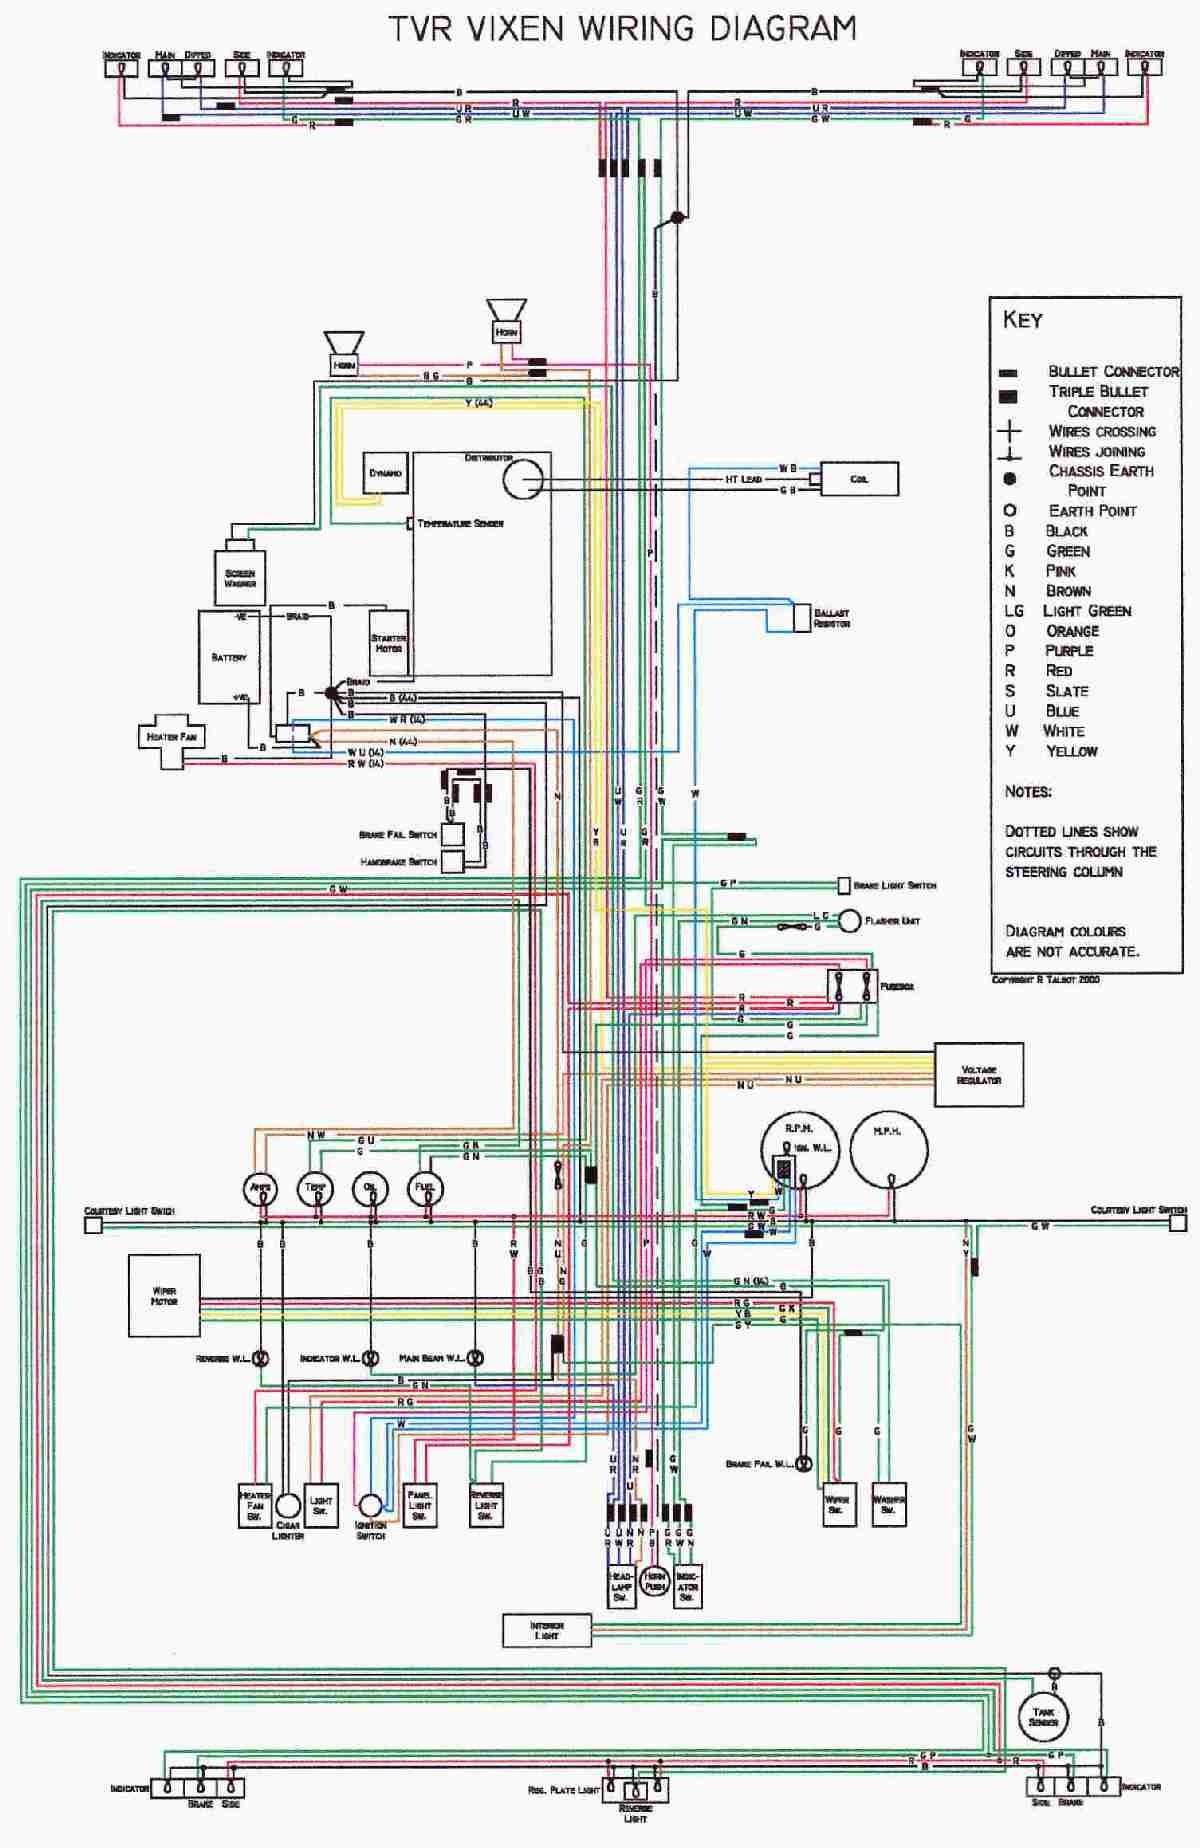 Ultra Small & Light Weight Rwd Idea Page 5 A Mild Tune Run A Deep O D Run A Final 3 7 Higher Suzuki Every Wiring Diagram